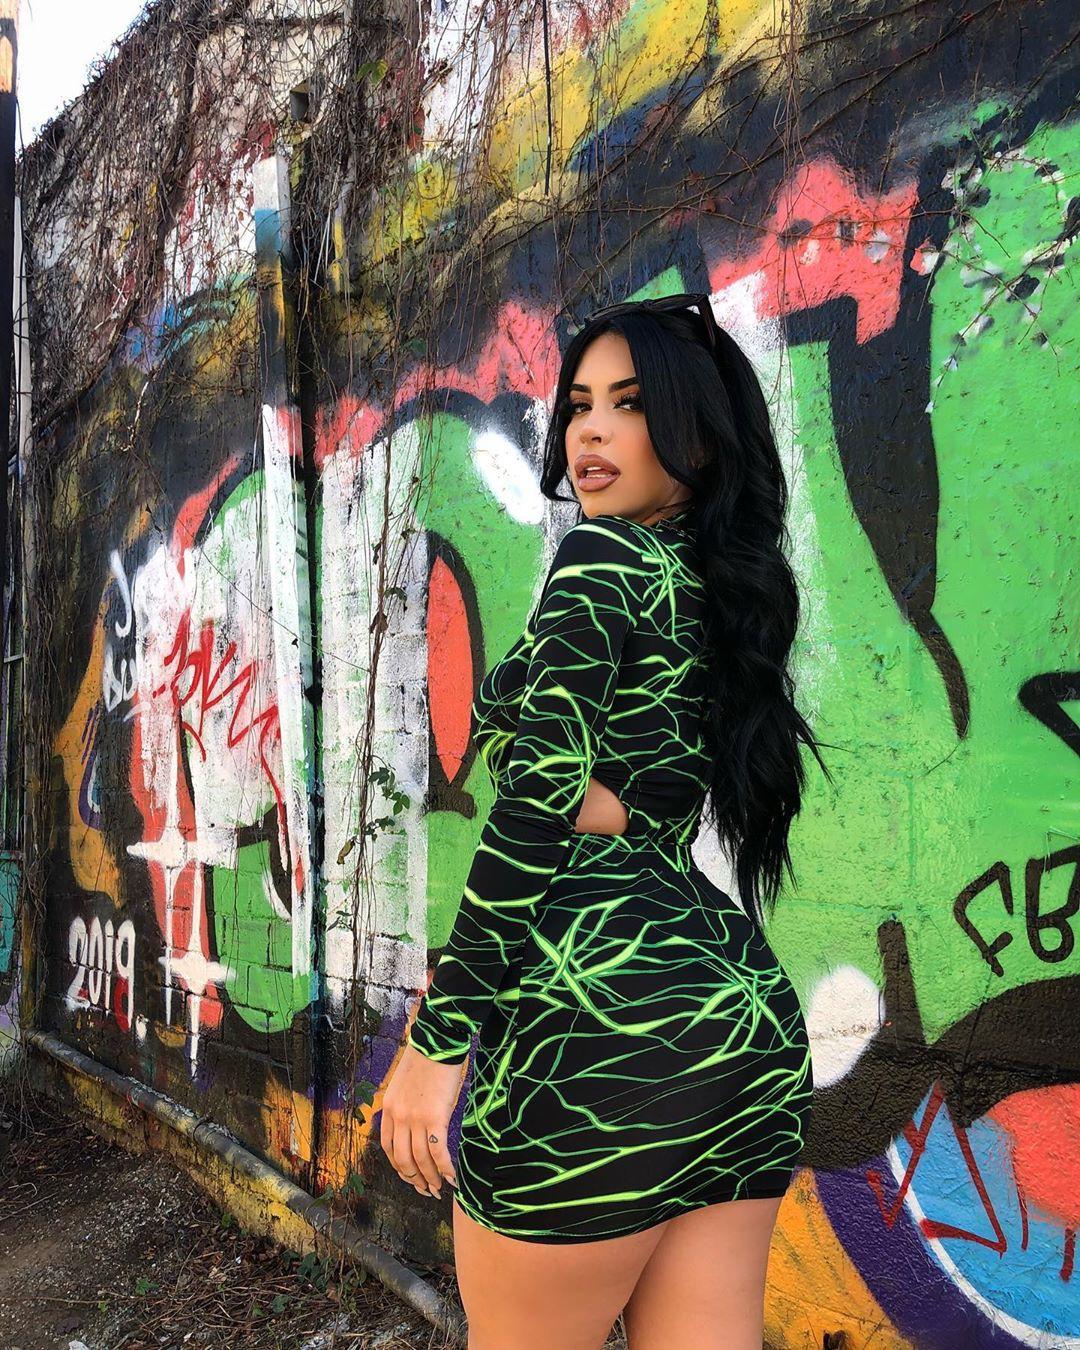 Valeria girls photoshoot, Cool Girls, wardrobe ideas